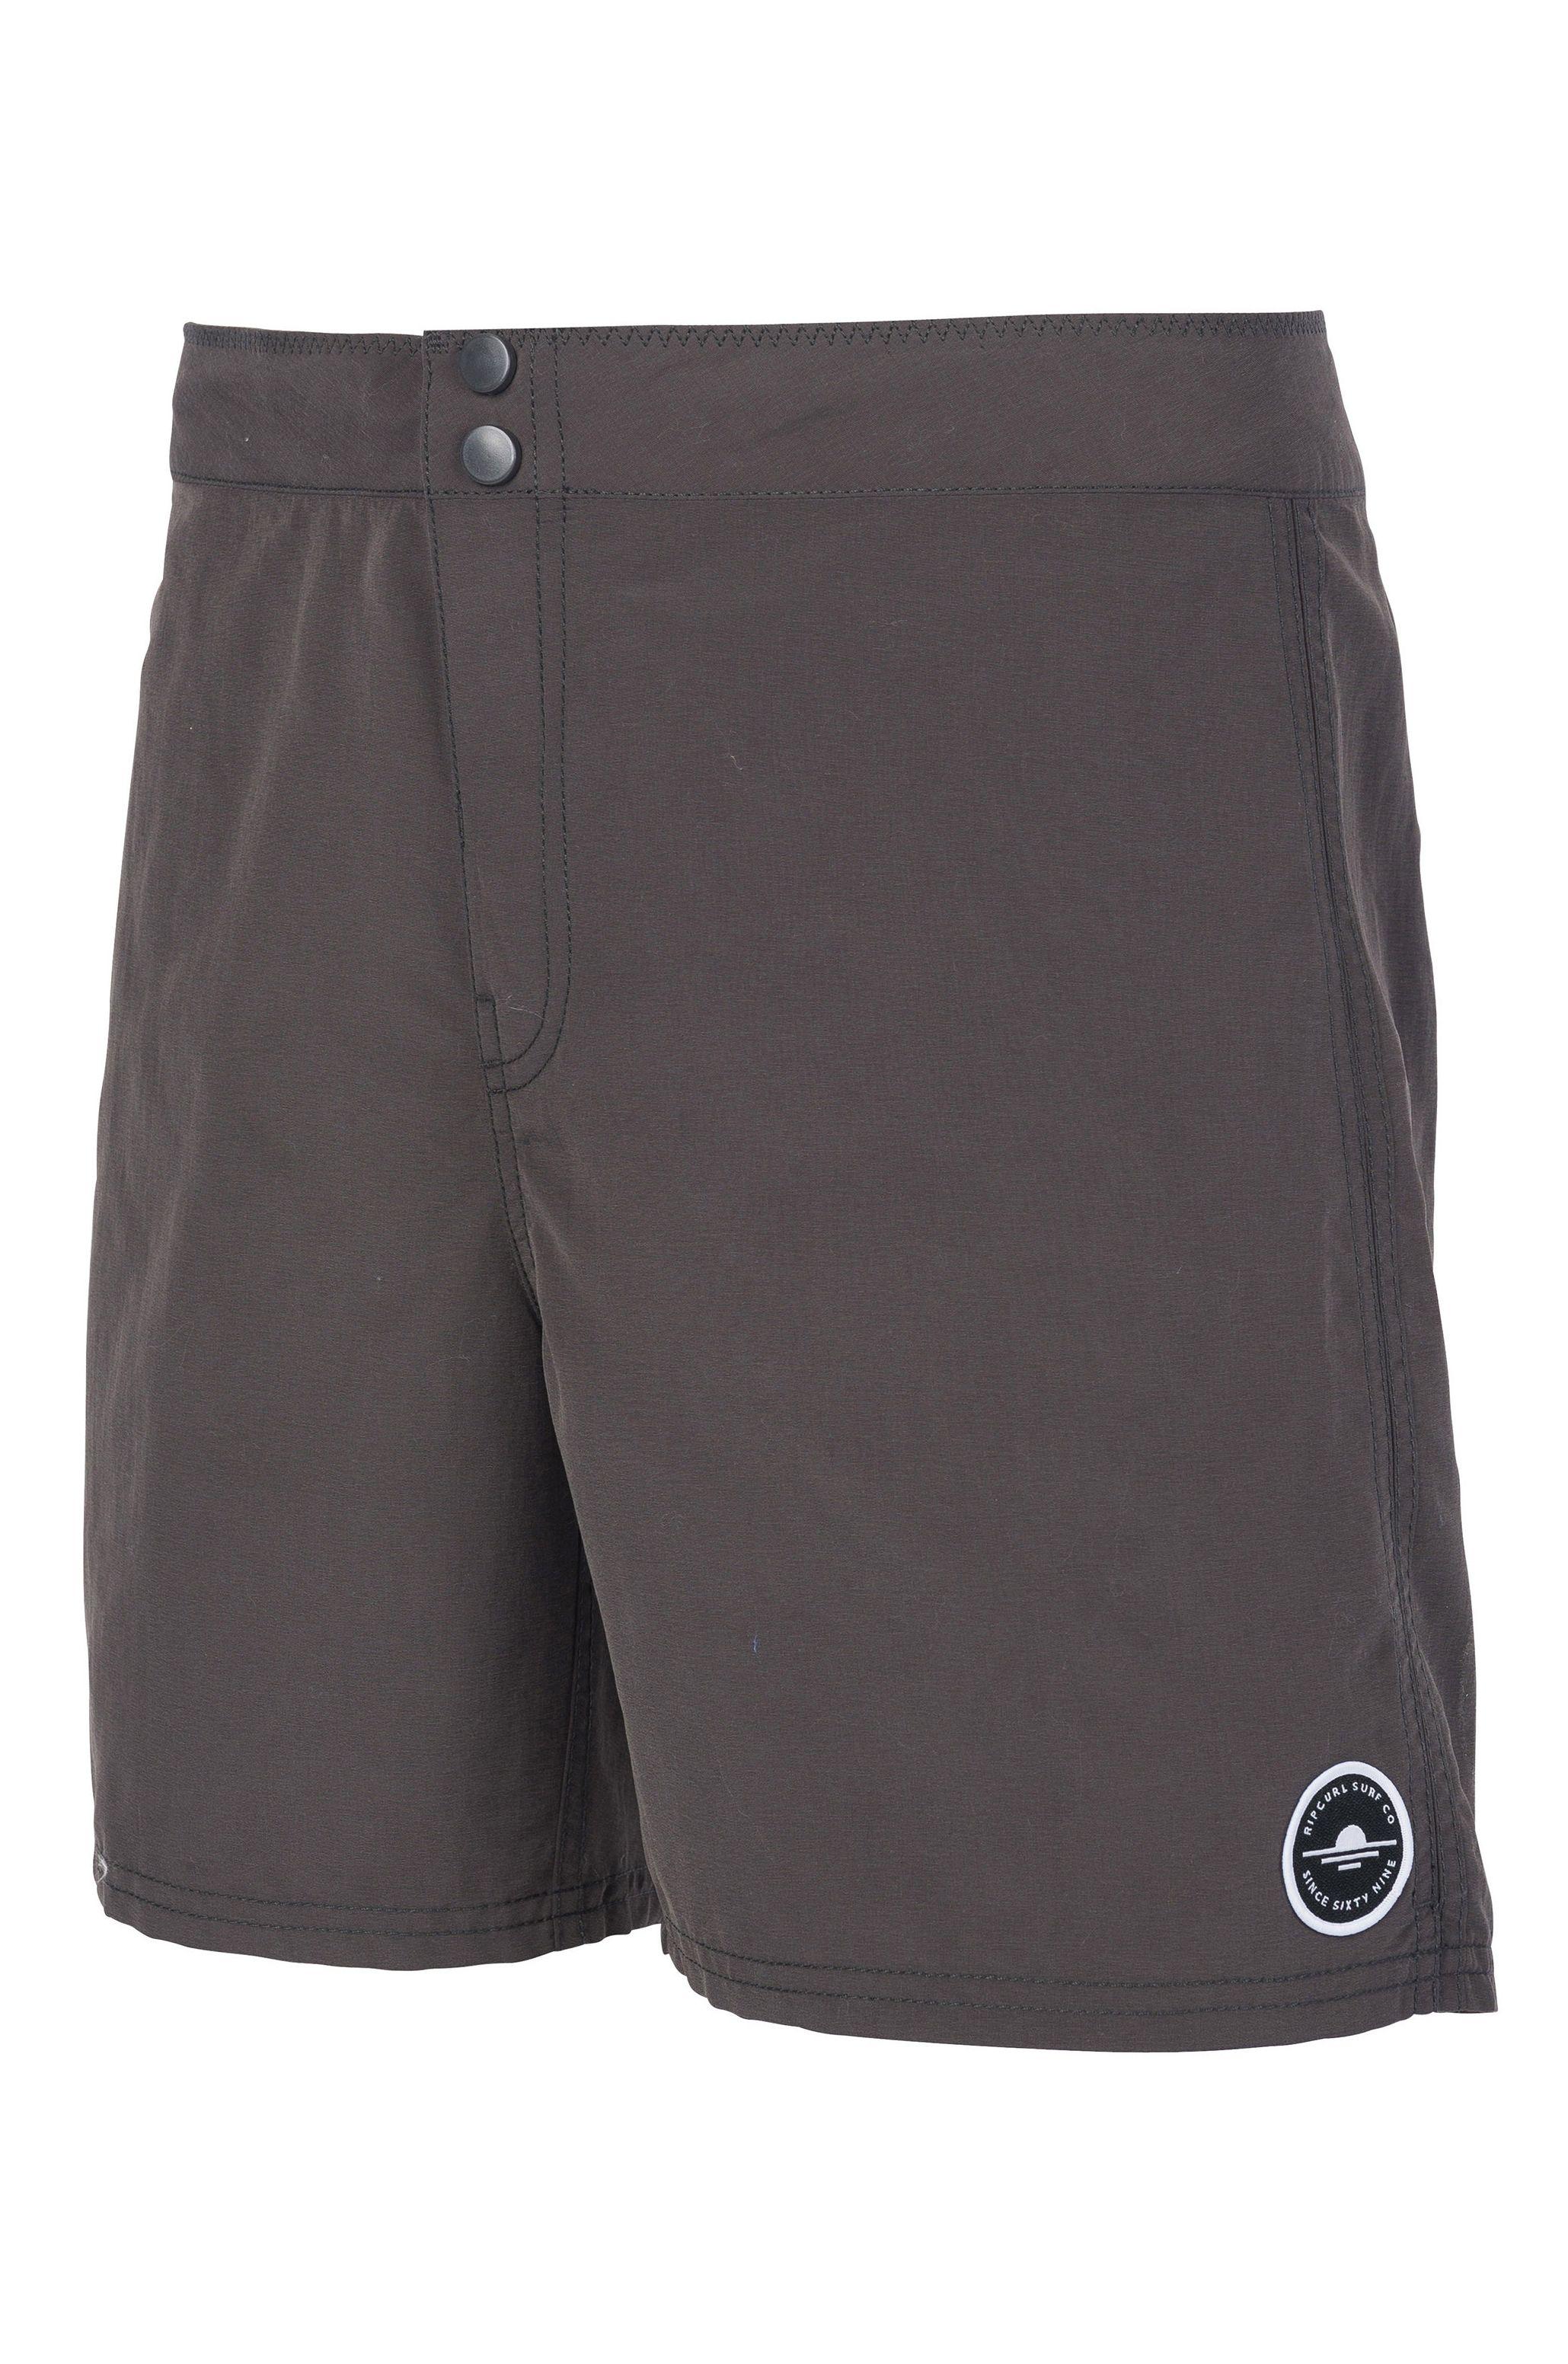 Rip Curl Boardshorts RETRO VENTURE 17'' Black